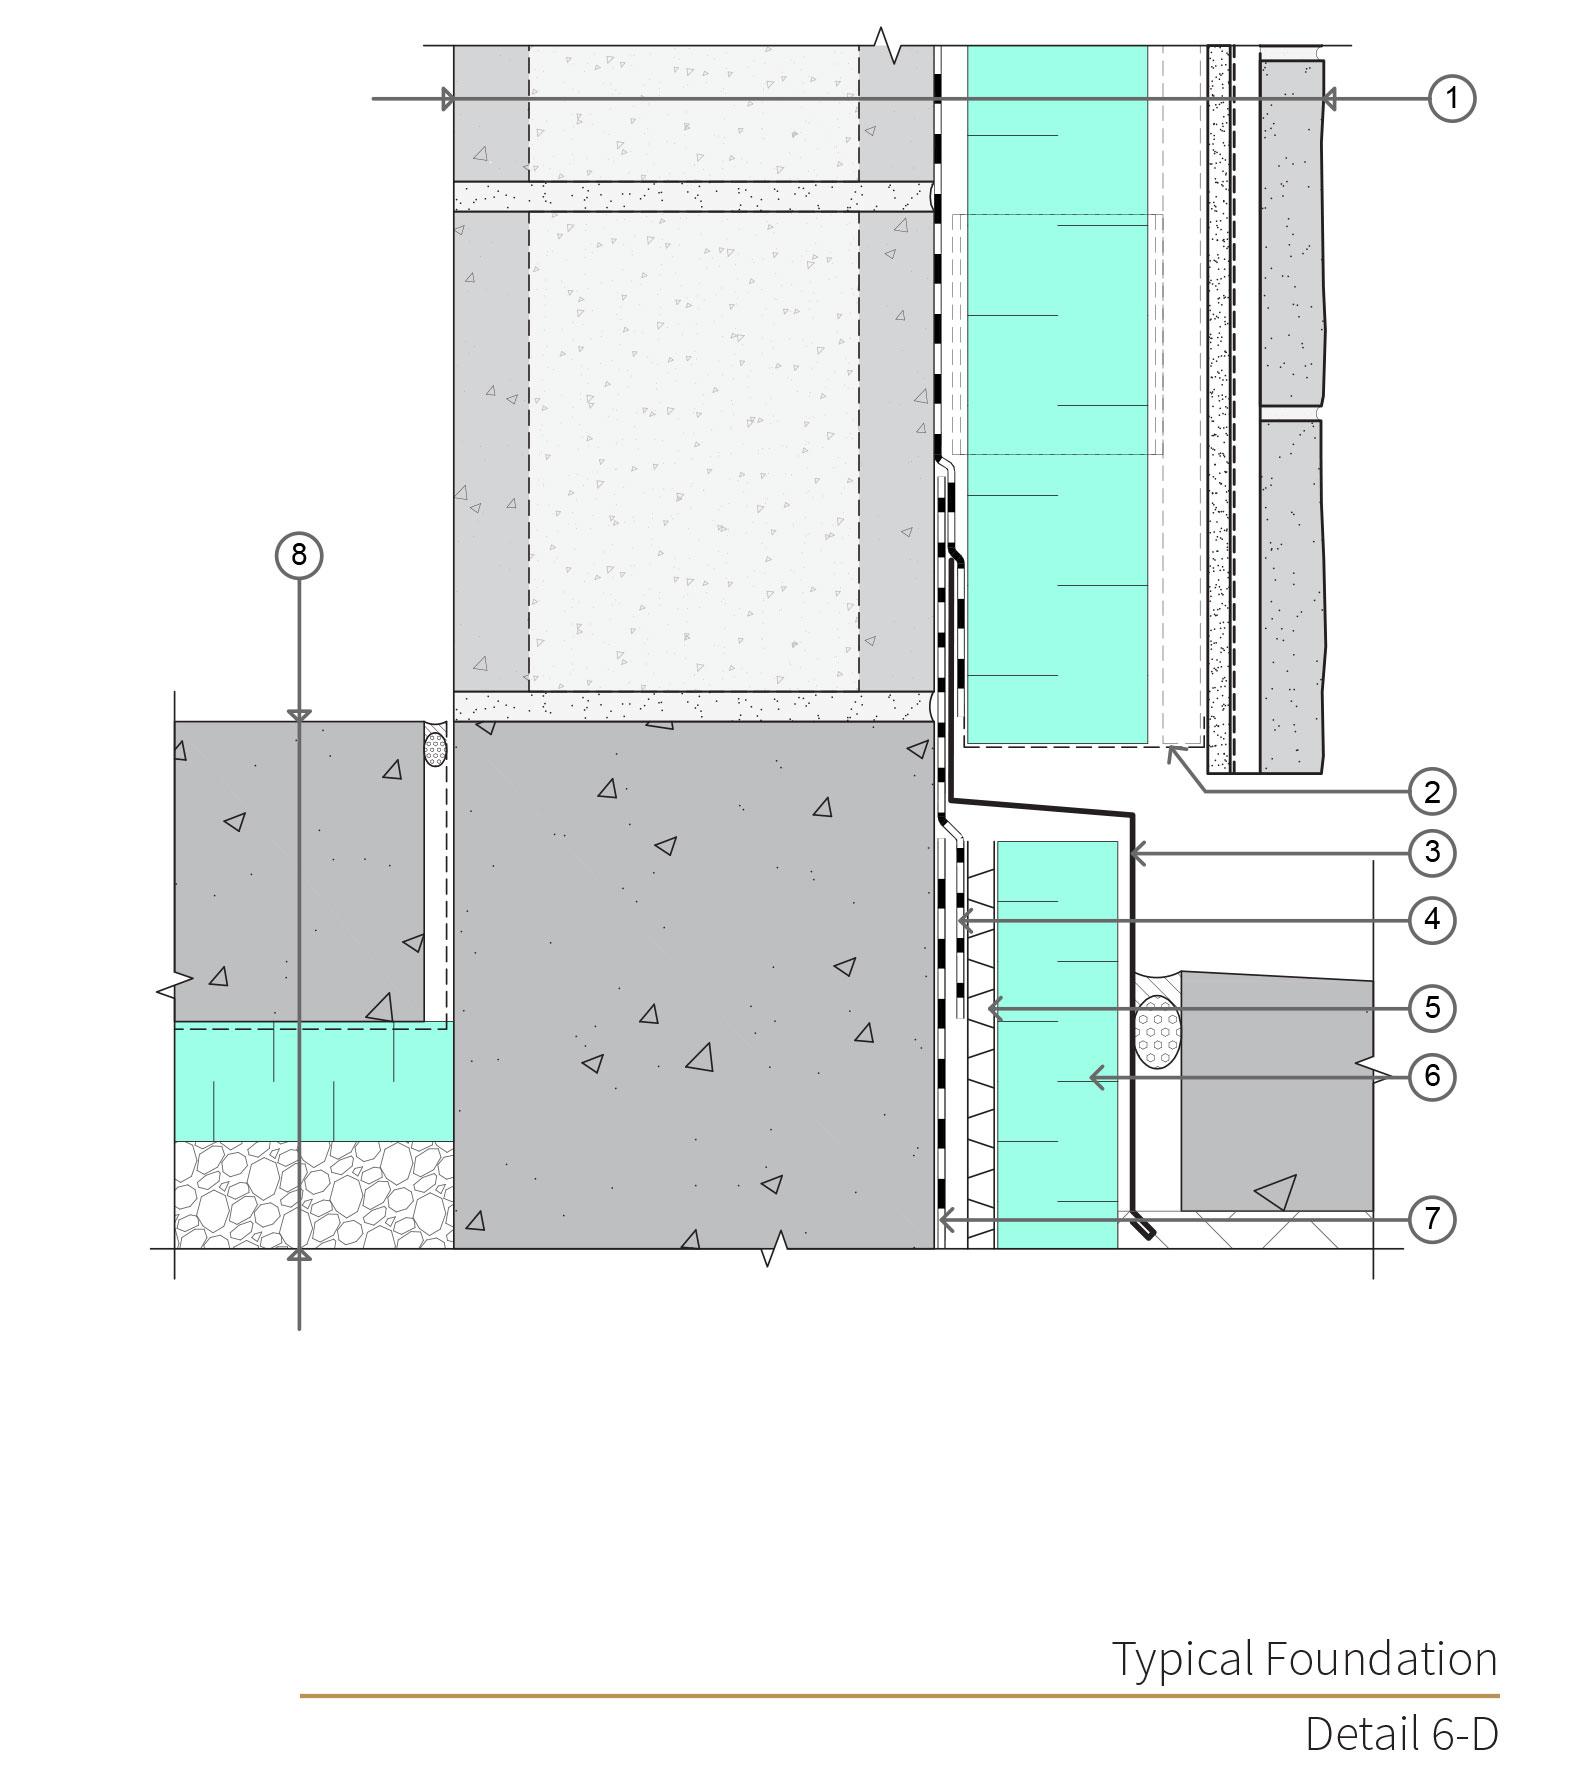 Assembly 6 Detail 6D